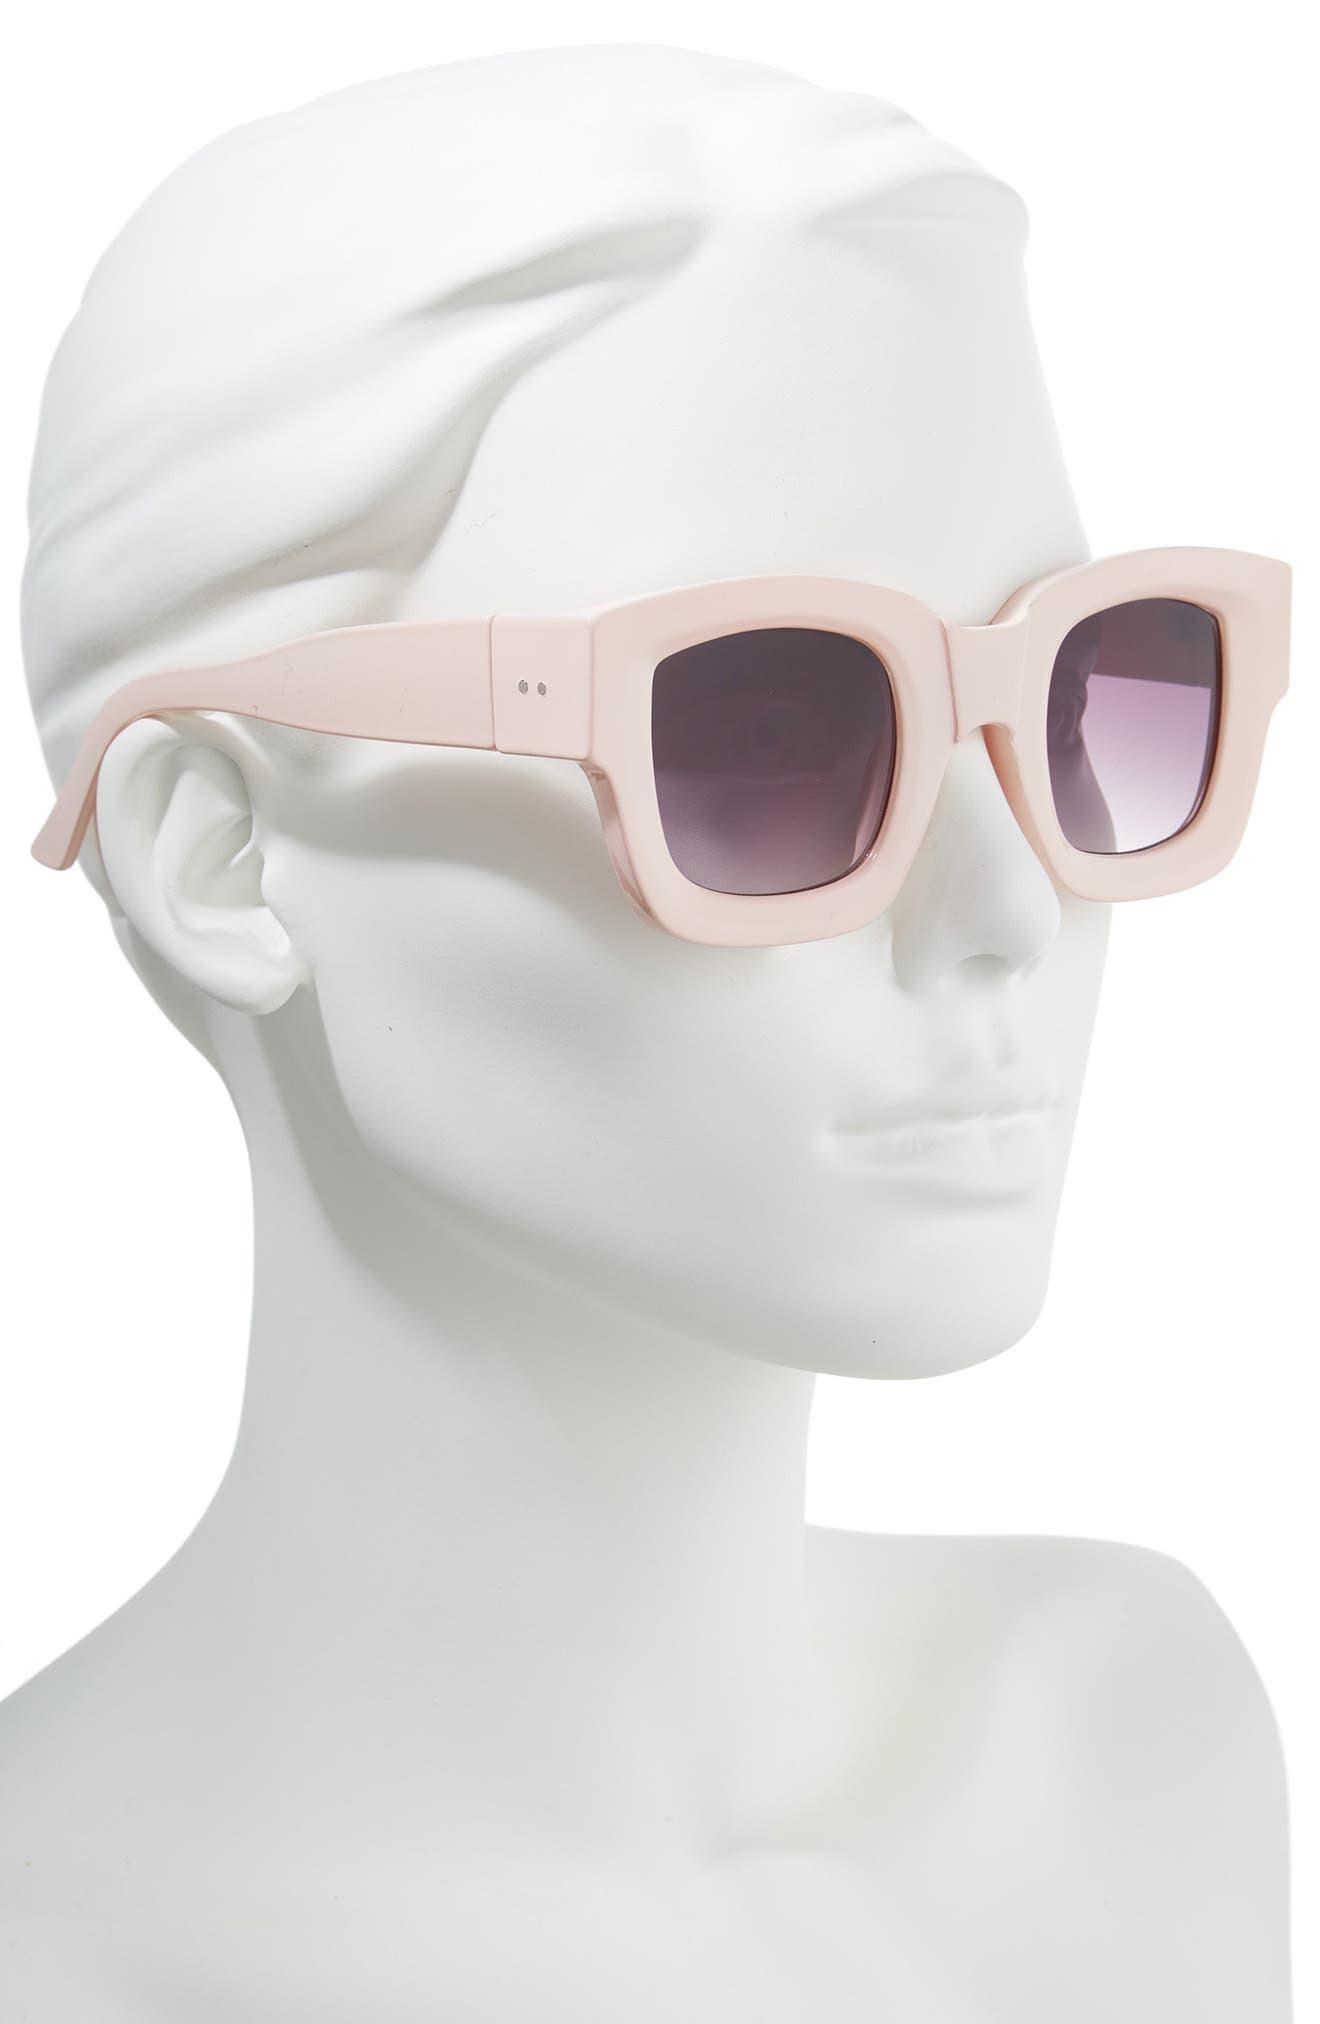 45mm Square Sunglasses,                             Alternate thumbnail 2, color,                             PALE PINK